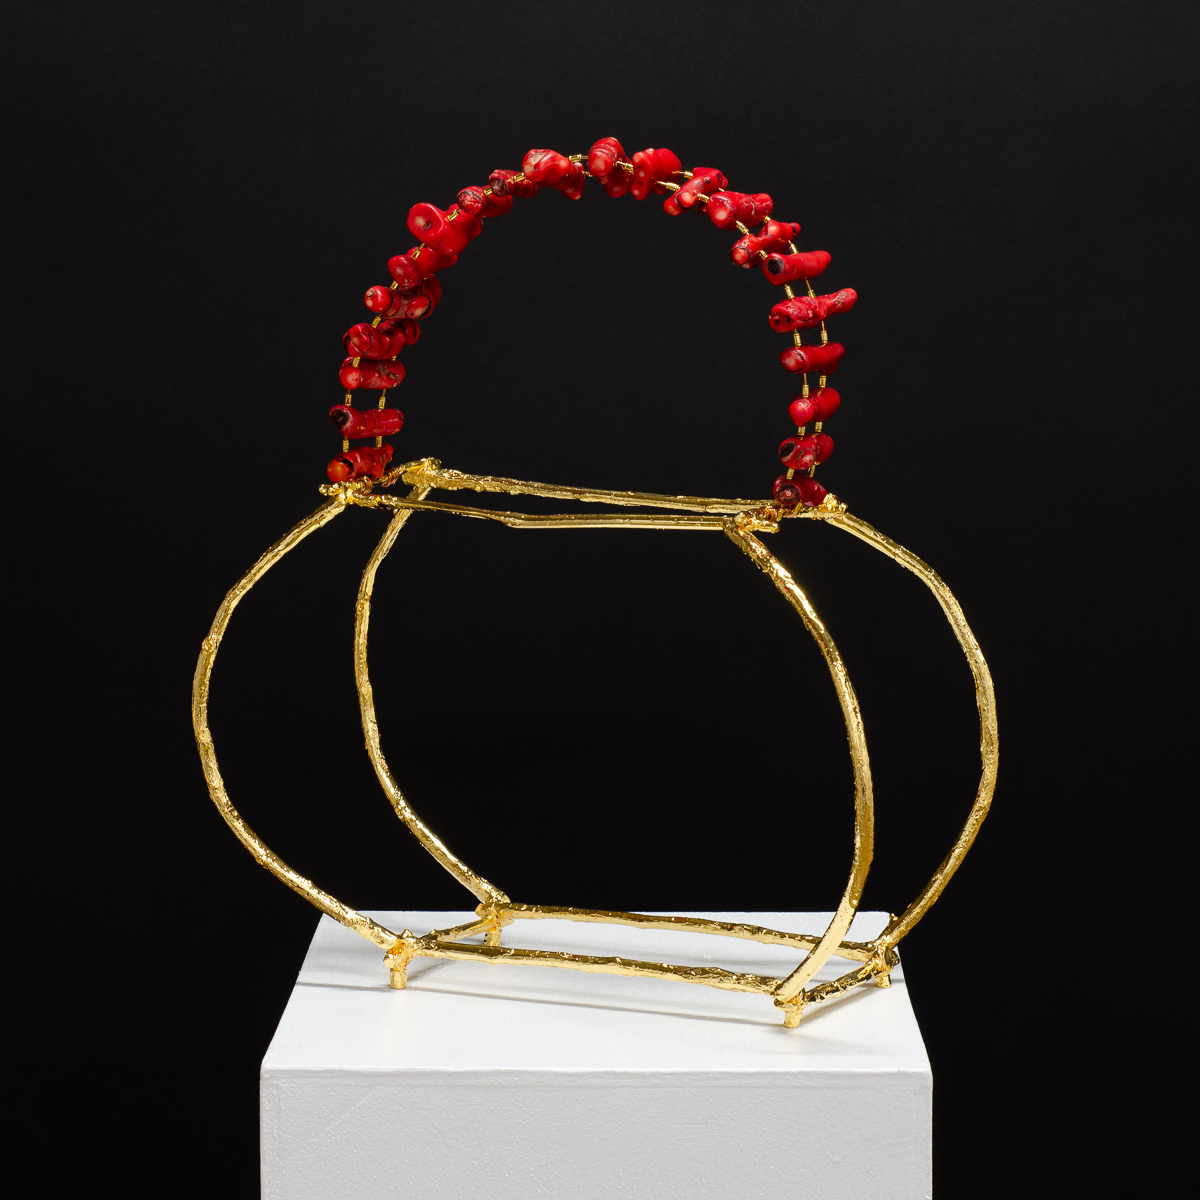 GINGER, Sculpture by Beatriz Gerenstein. Handbag made in Bronze, 24K Gold plating,, and red corals.